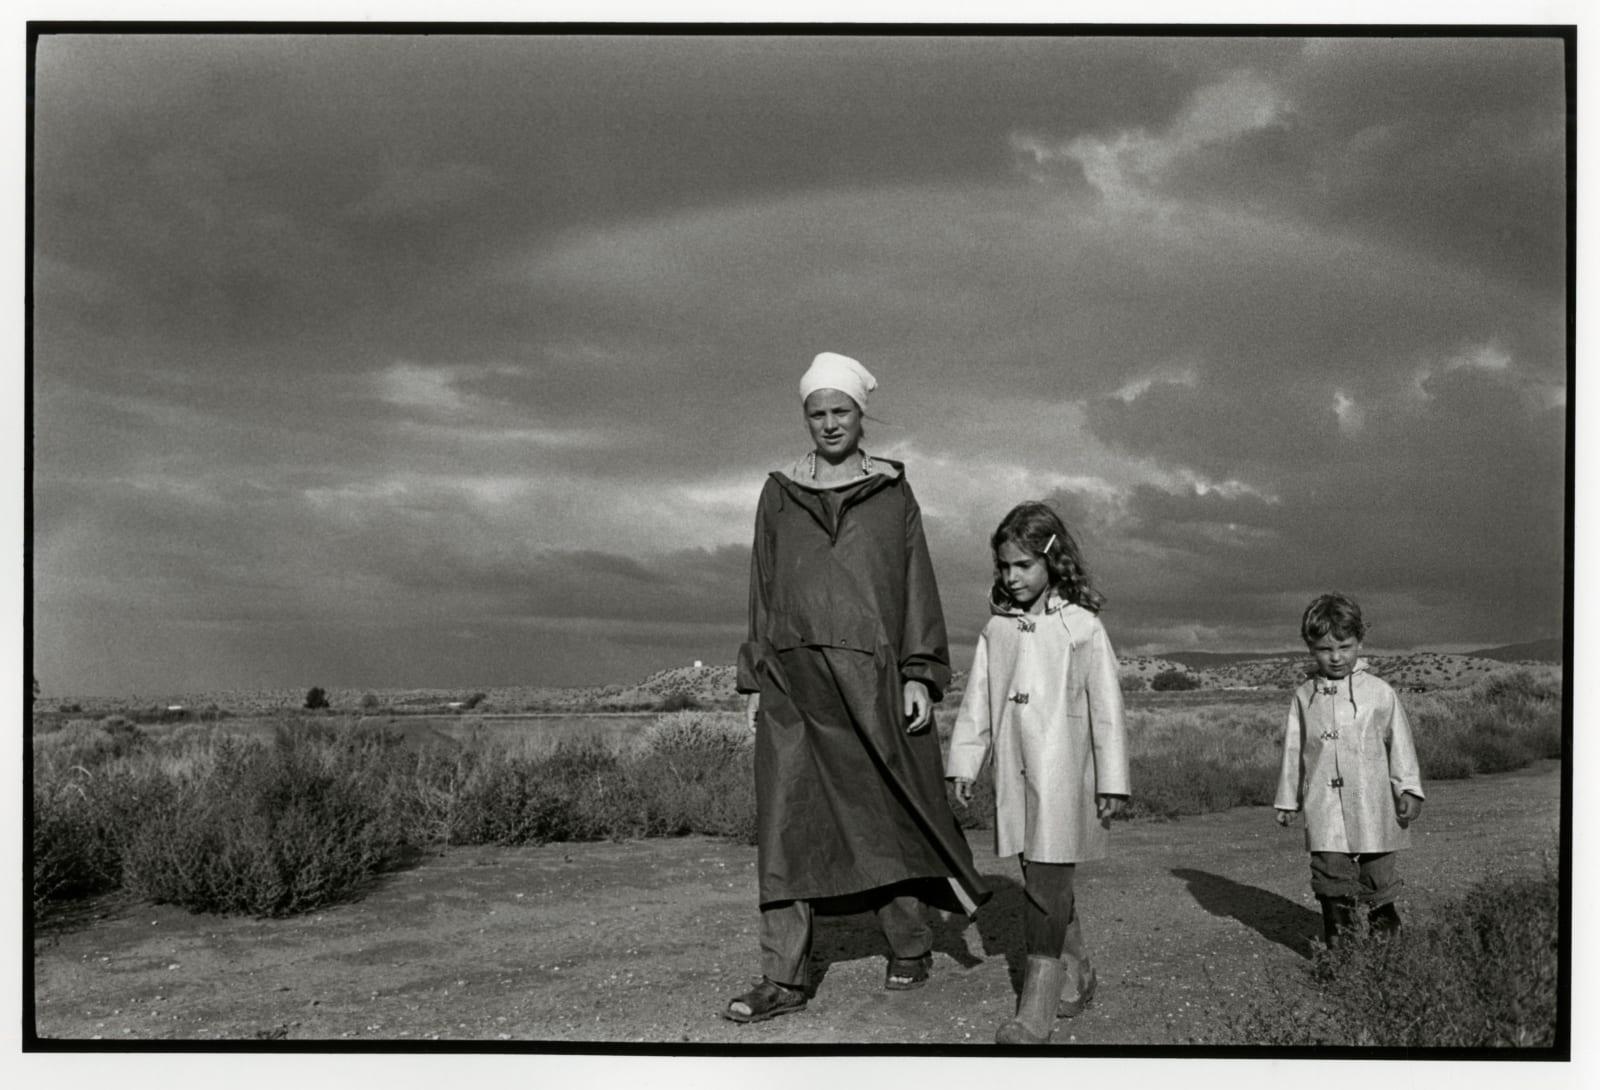 Danny Lyon - Nancy, Gabrielle, and Raphe, Llanito, August, 1979